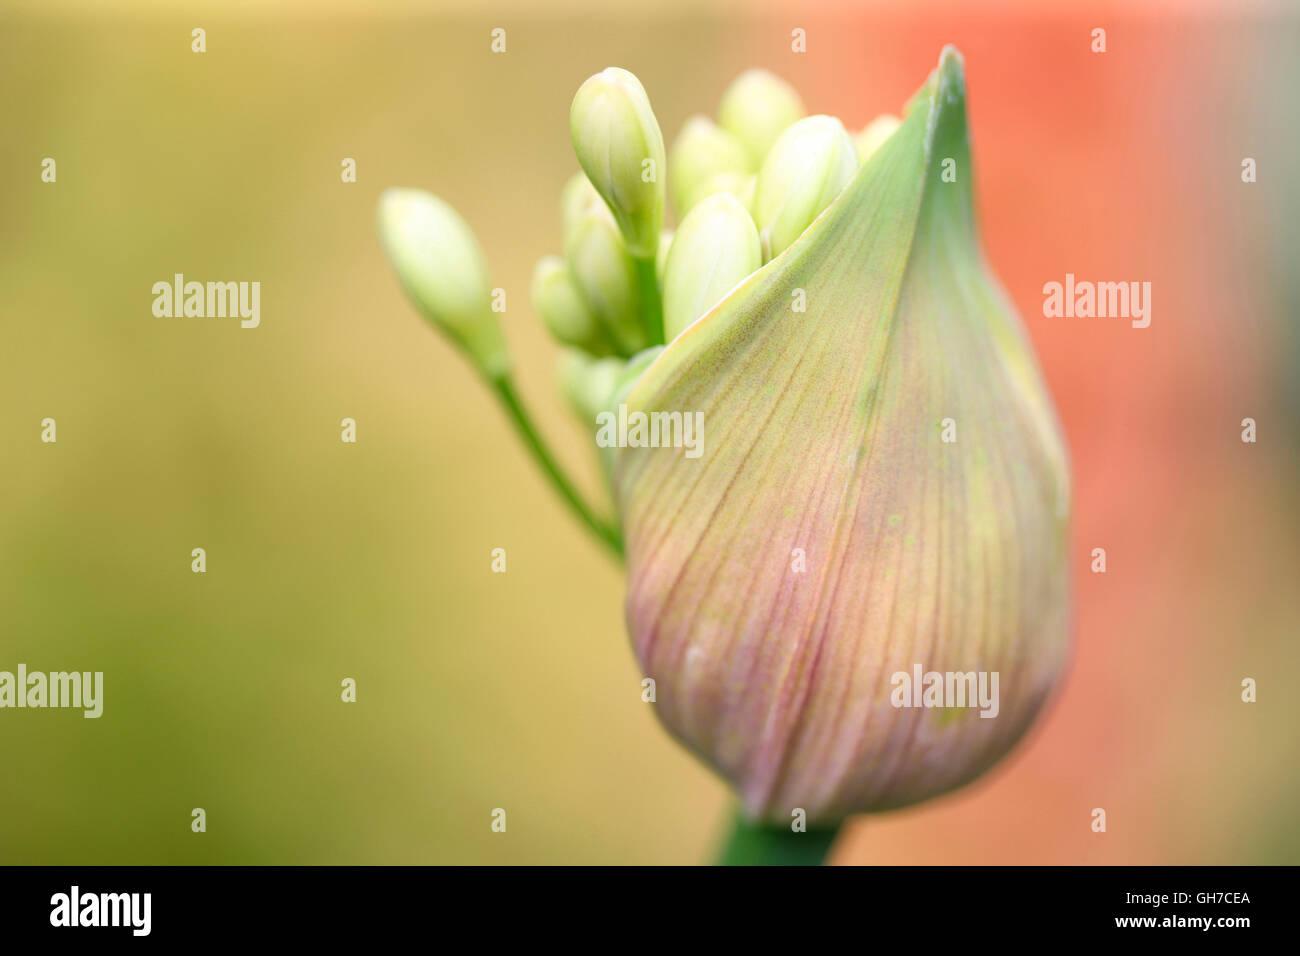 Agapanthus seed pod bursting with nature's energy Jane Ann Butler Photography JABP1550 - Stock Image